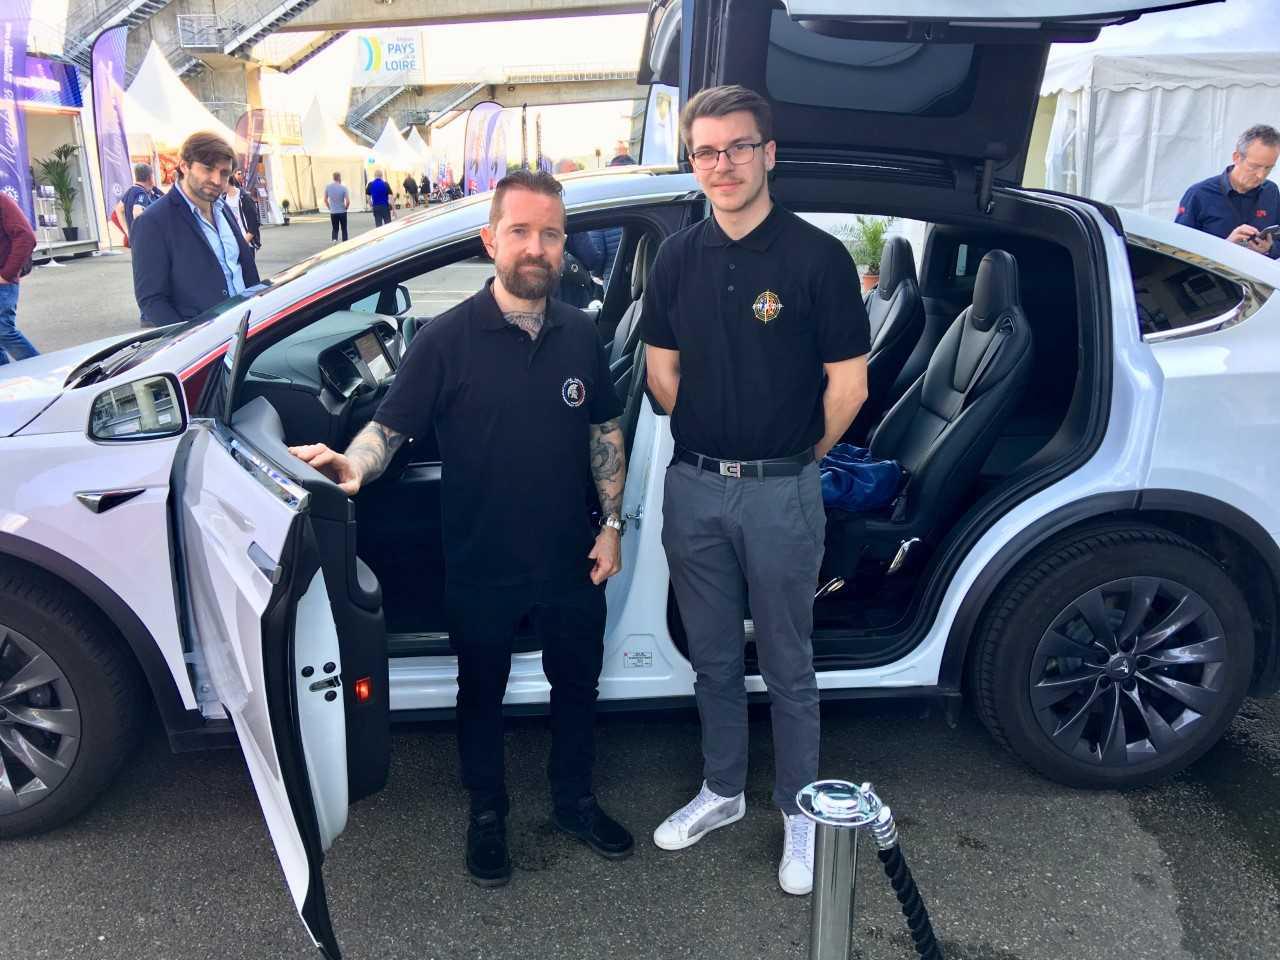 Le mans 2019 Tesla.jpg